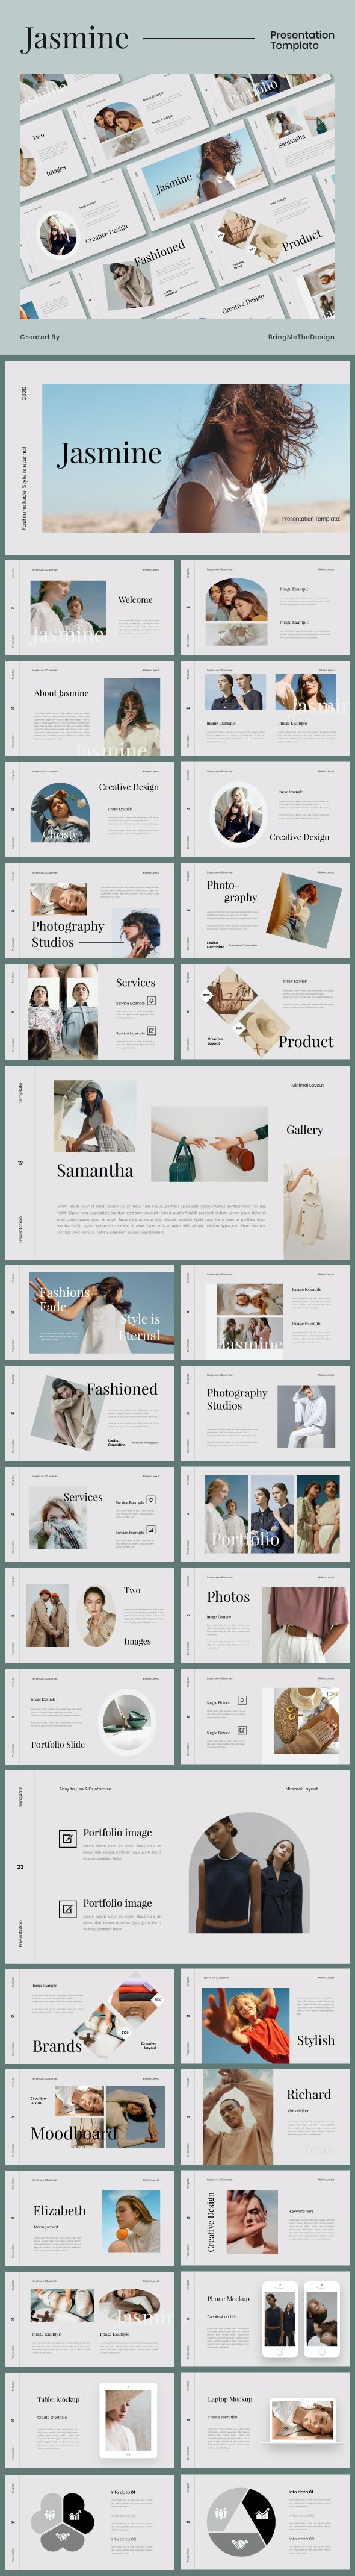 Jasmine Fashion Google Slides Pptx - Google Slides Presentation Templates